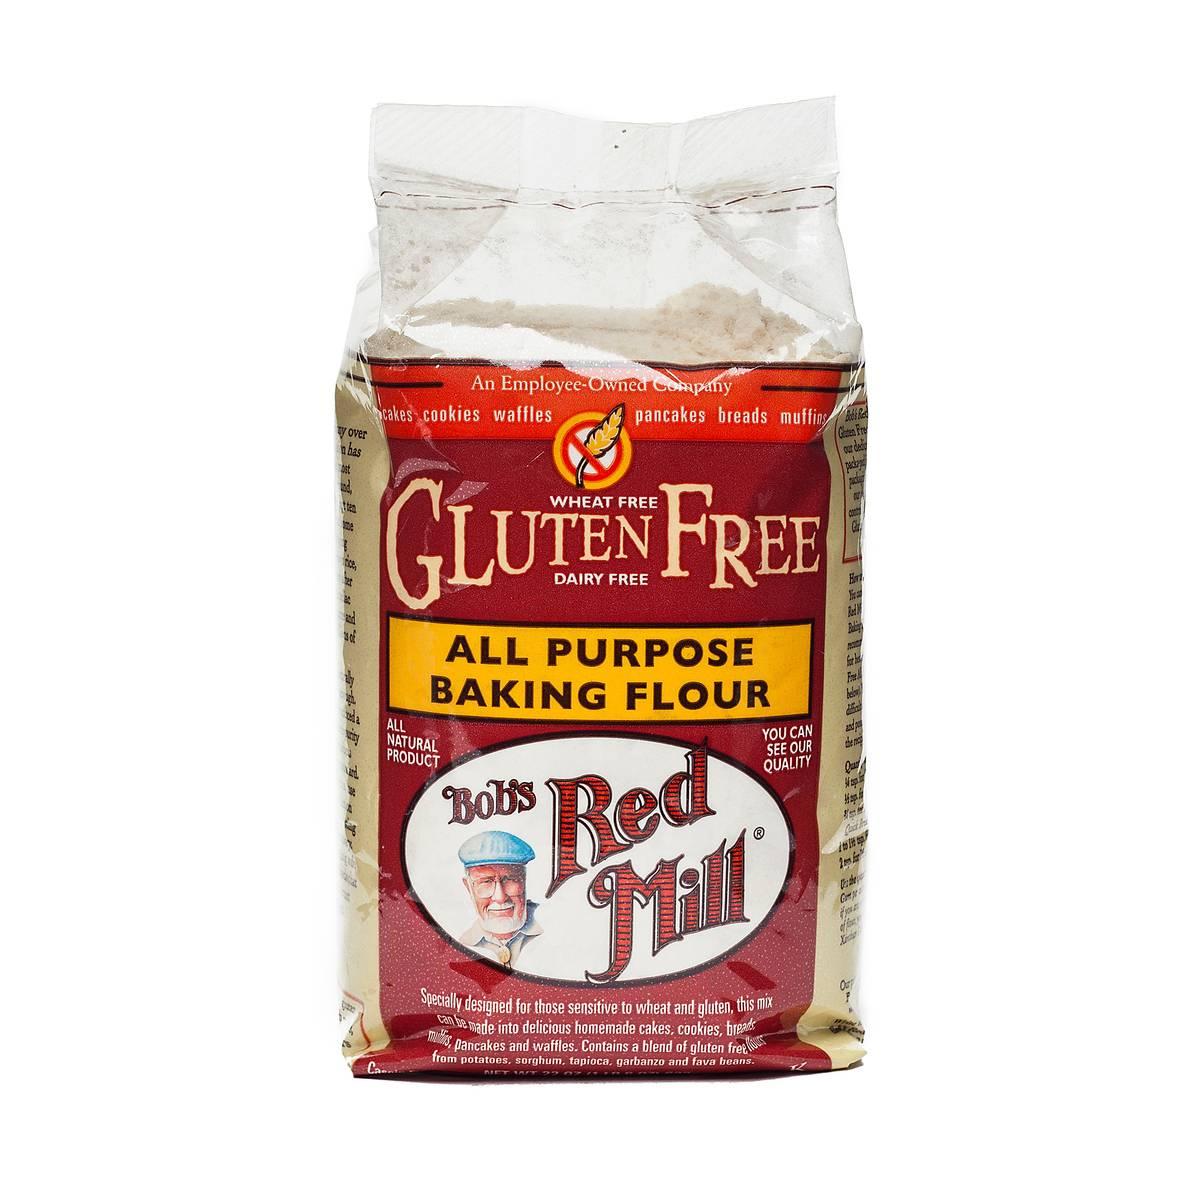 Gluten-Free All Purpose Baking Flour - Thrive Market